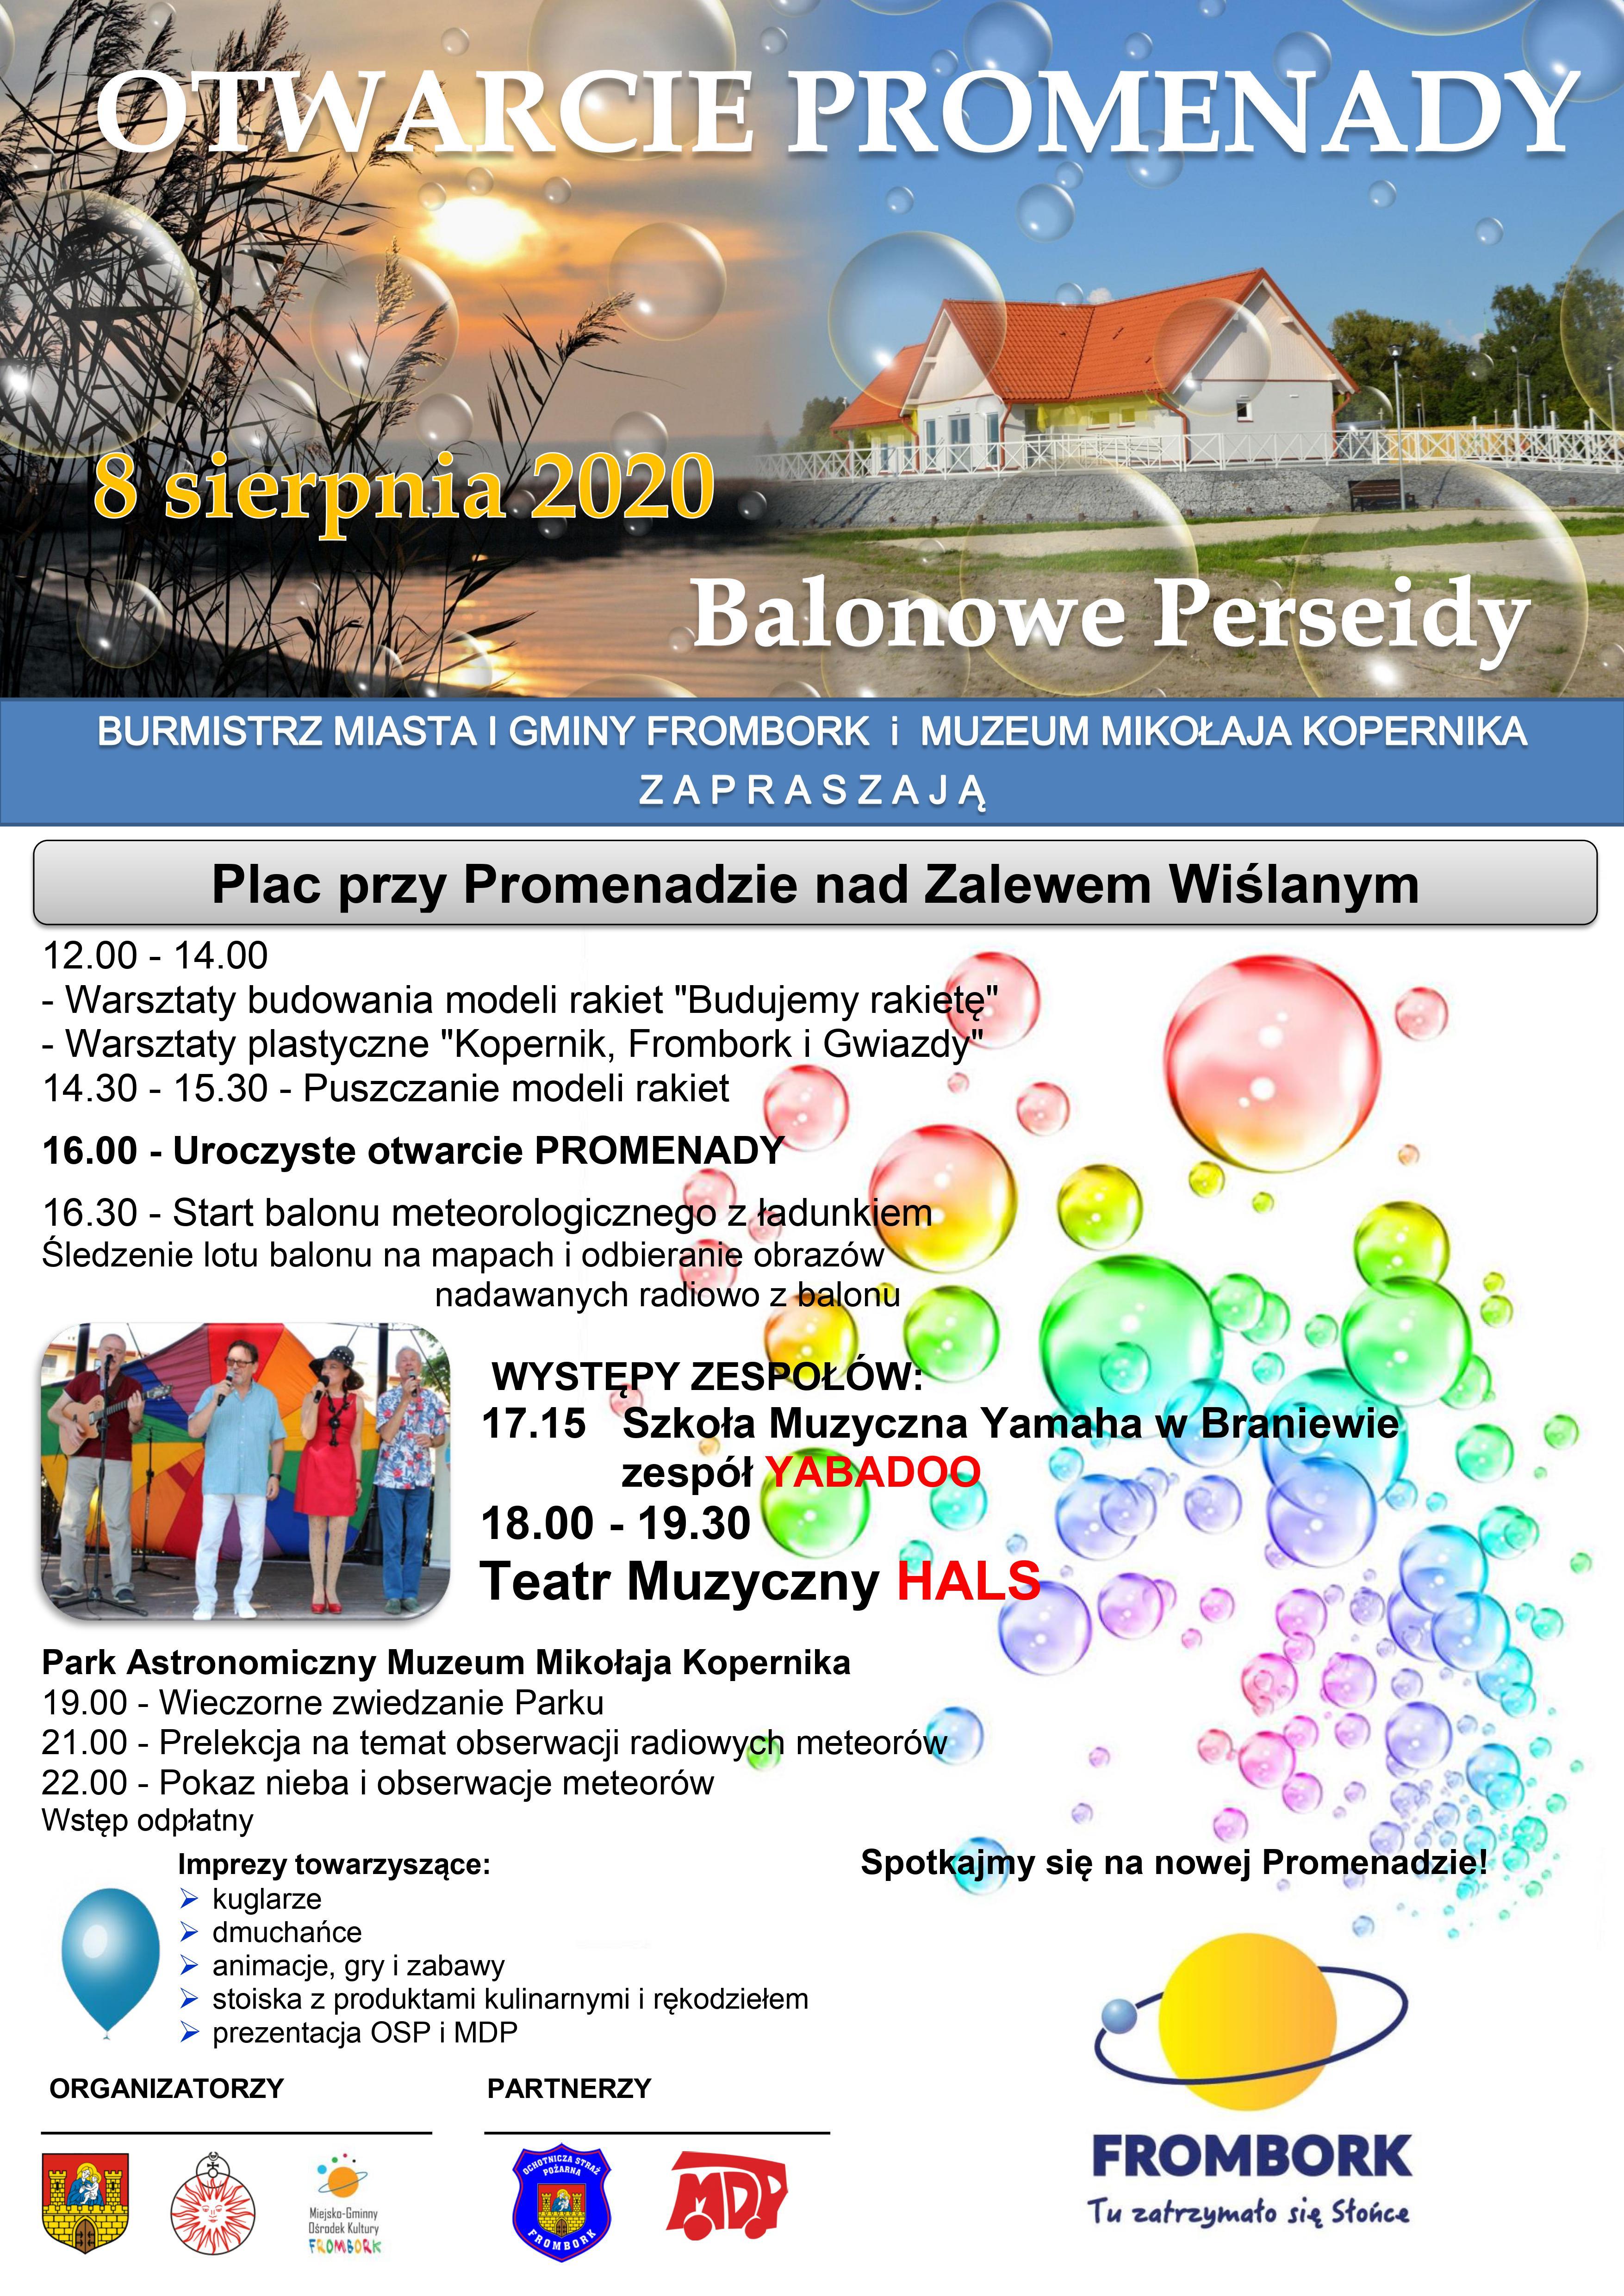 https://m.wm.pl/2020/07/orig/plakat-otwarcie-promenady-i-balonowe-perseidy-ii-639129.jpg